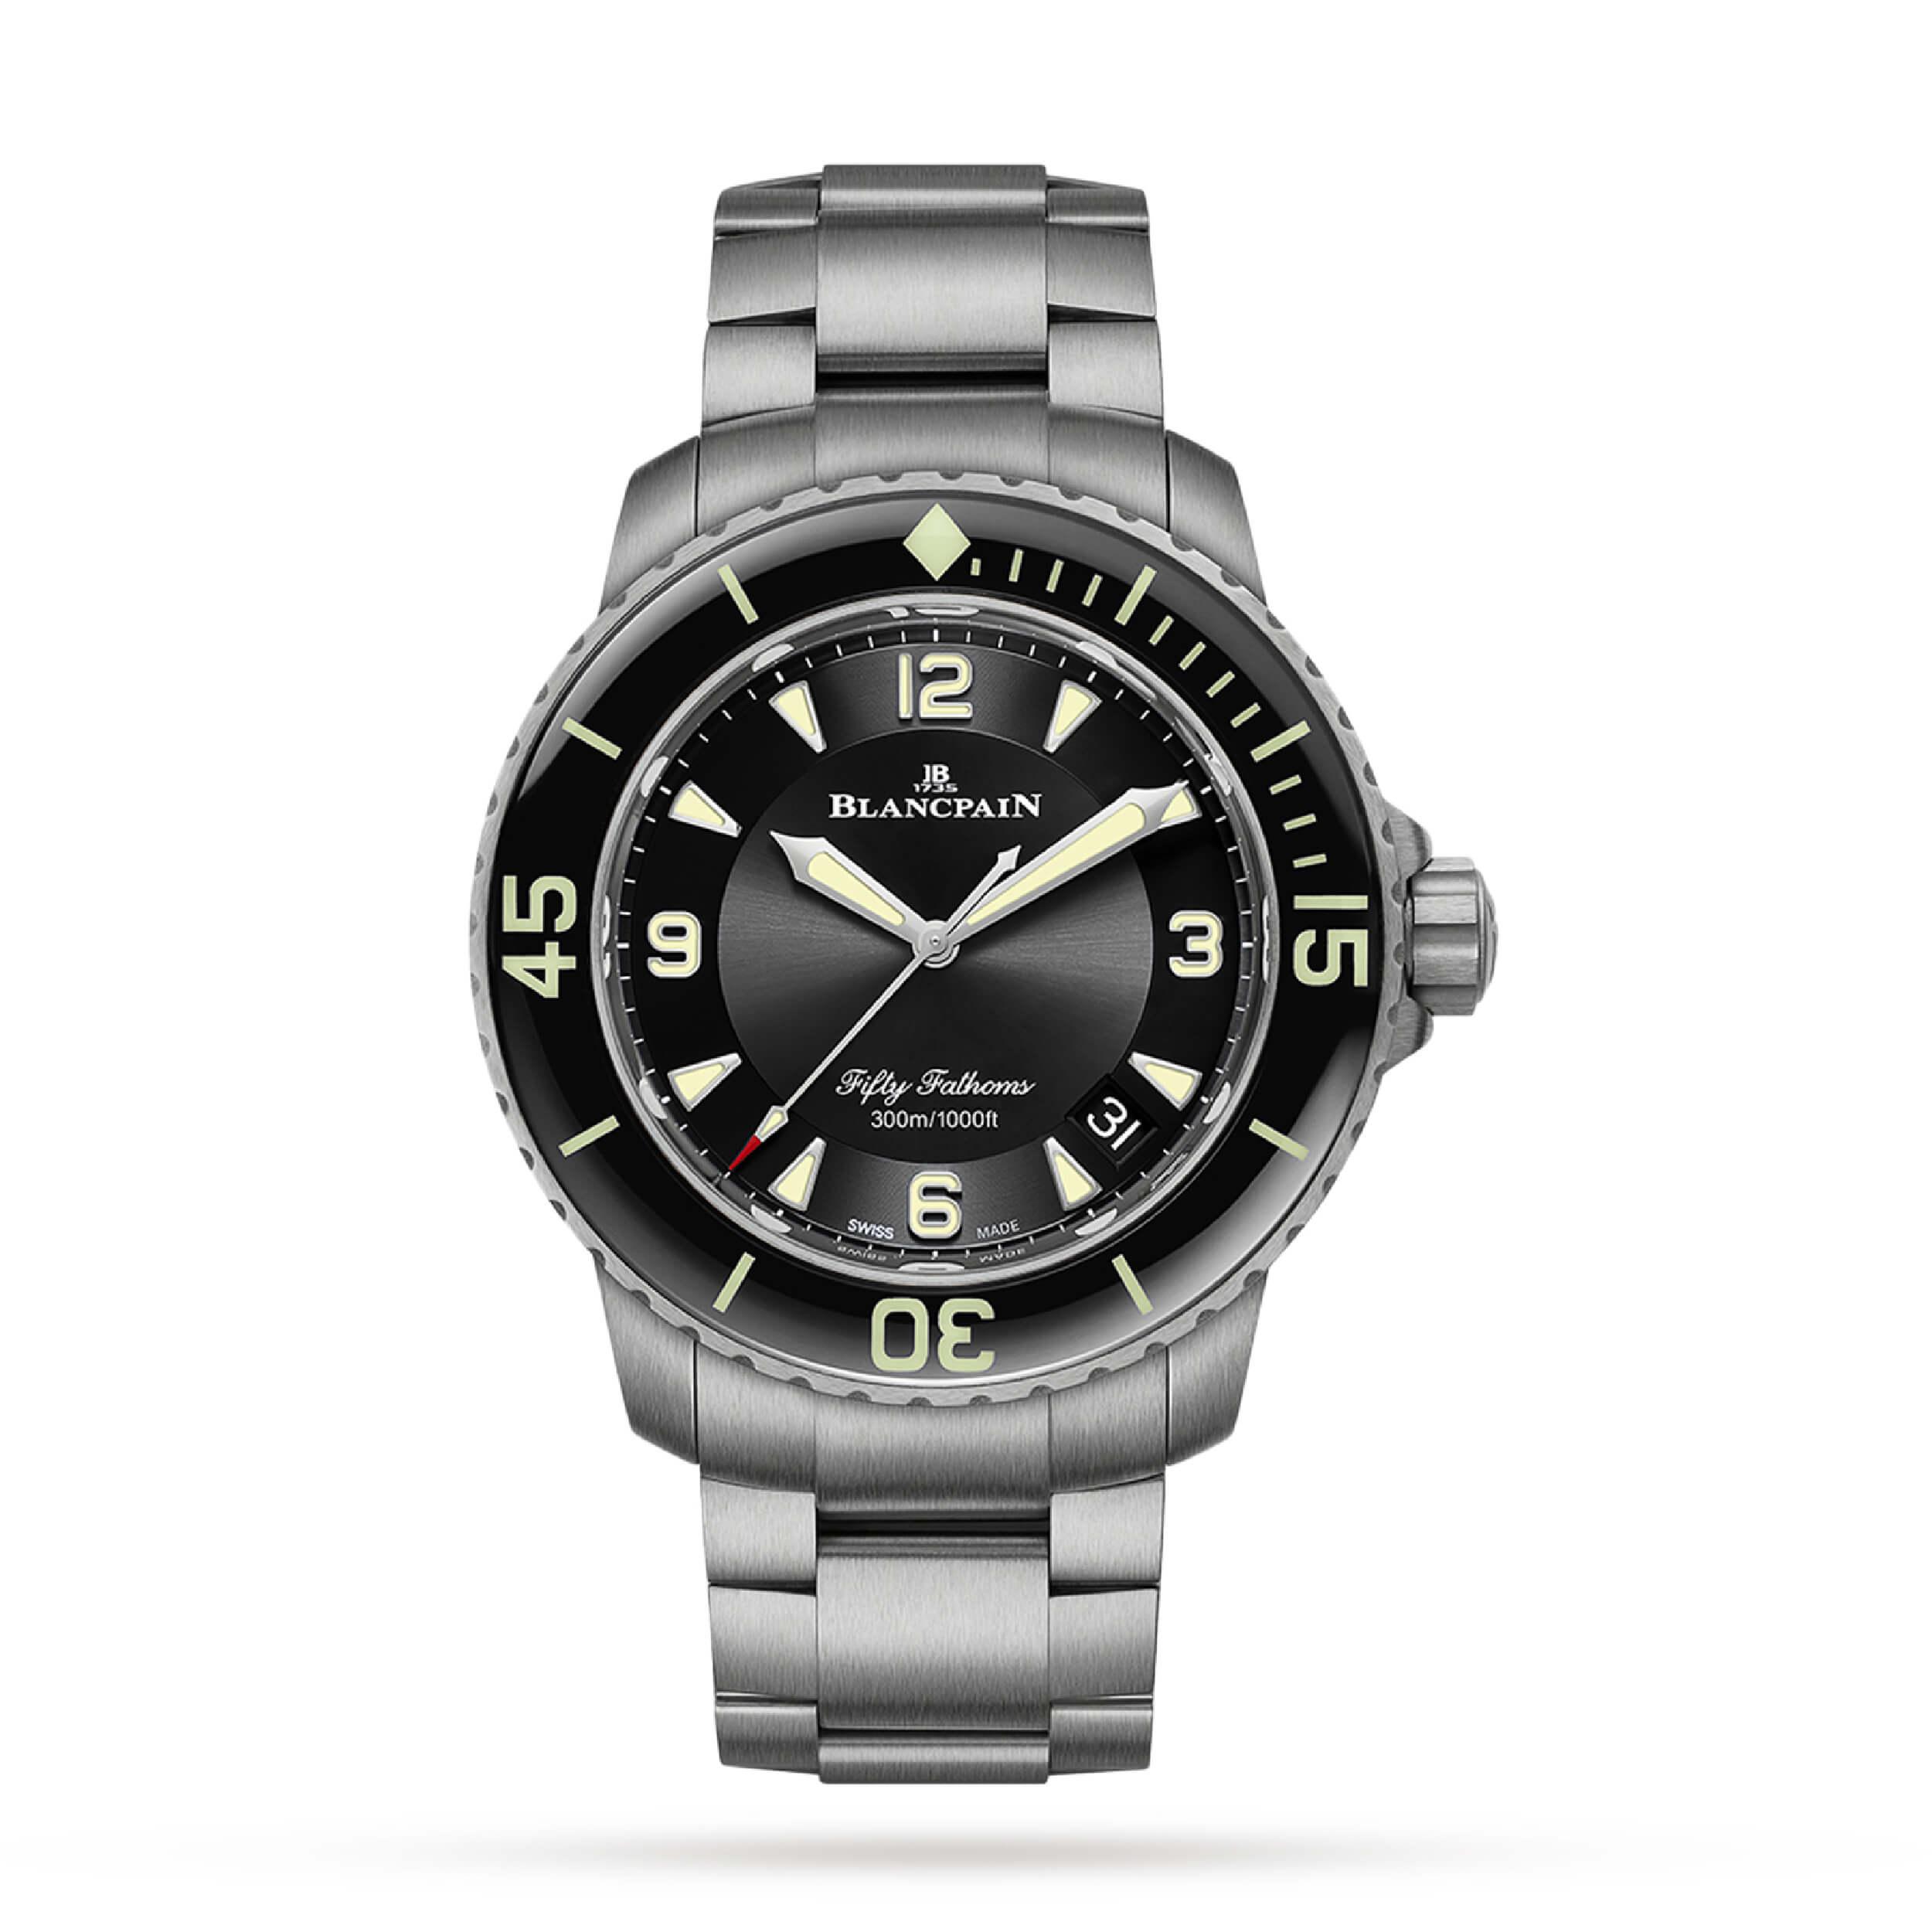 Blancpain Fifty Fathoms Automatique | Wristwatches360